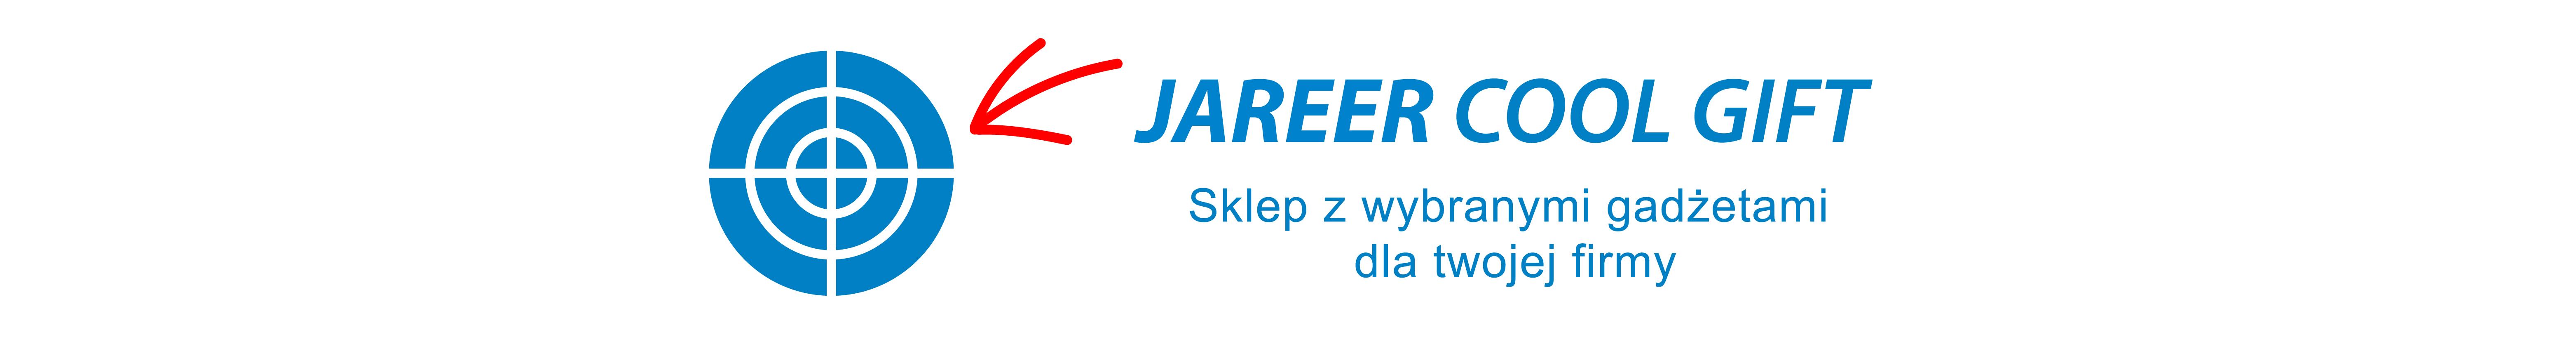 Banner cool JAREER